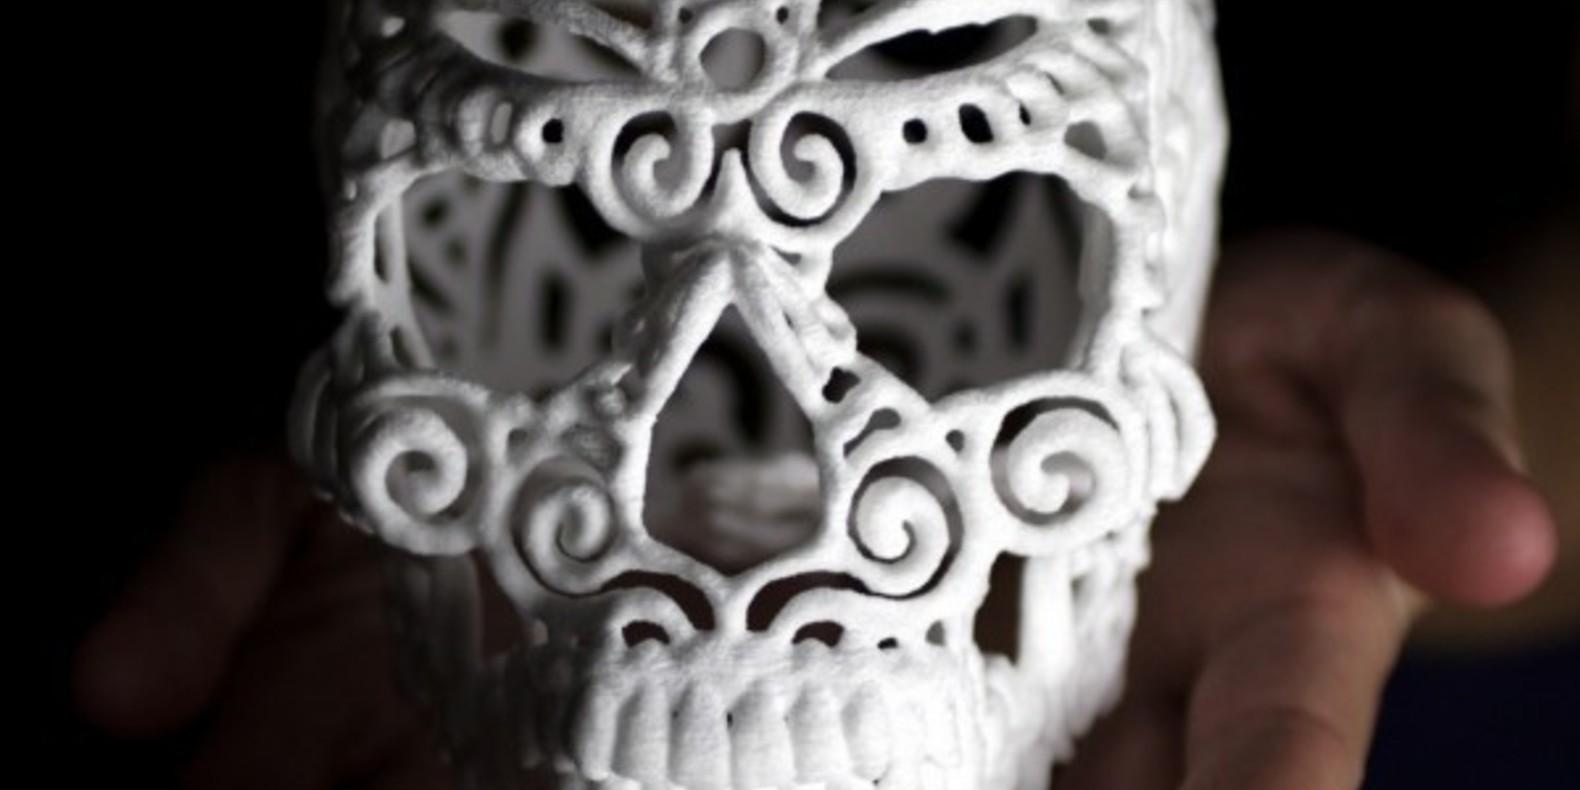 joshua josh harker designer design fichier 3D halloween sucre sugar lab skull crâne imprimé en 3D tête de mort cults cults 3D 2